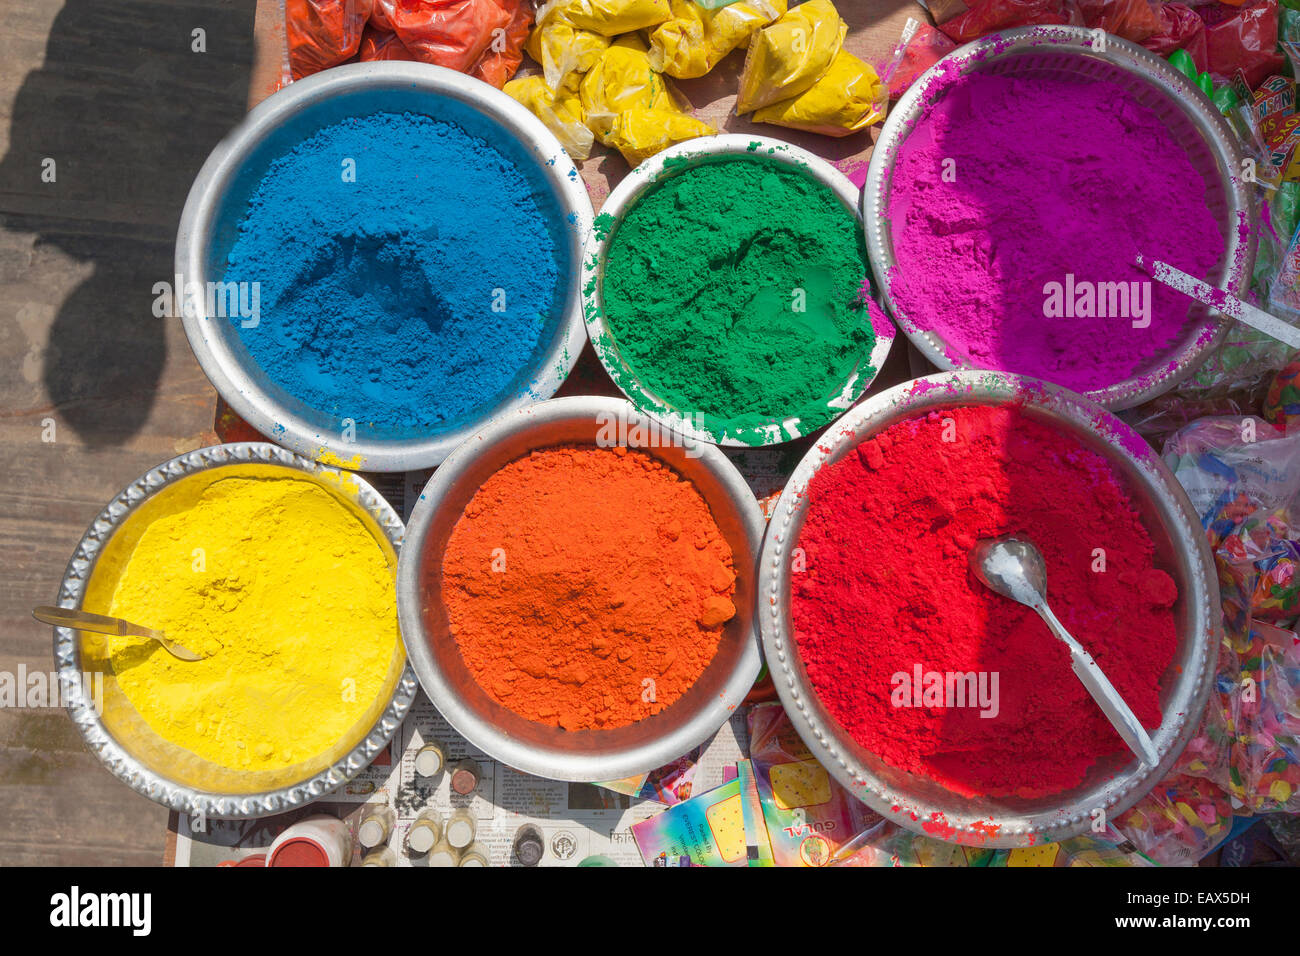 Multicoloured powder paints on sale for the Holi festival in Kathmandu, Nepal - Stock Image